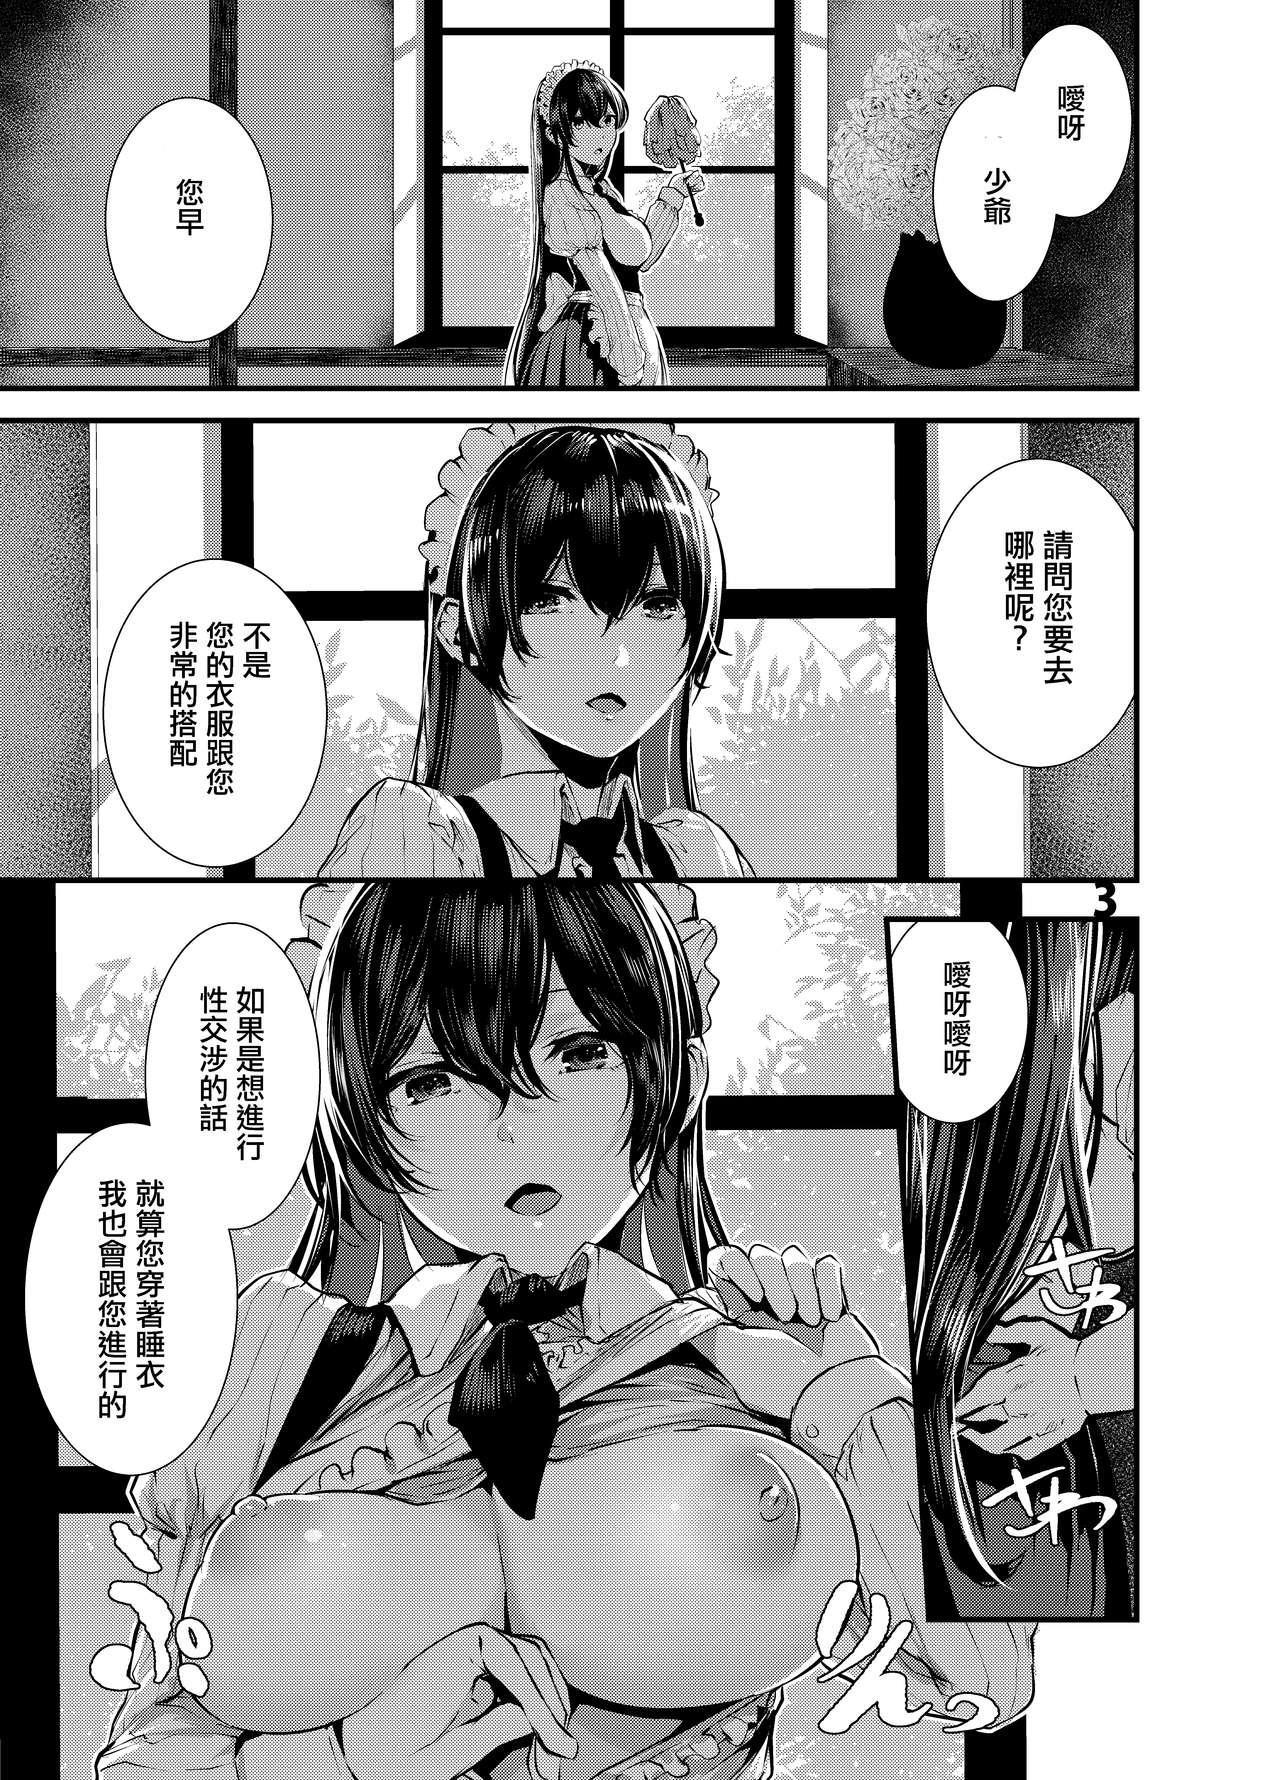 Maguro Maid to Mecha Shikotama Ecchi 1